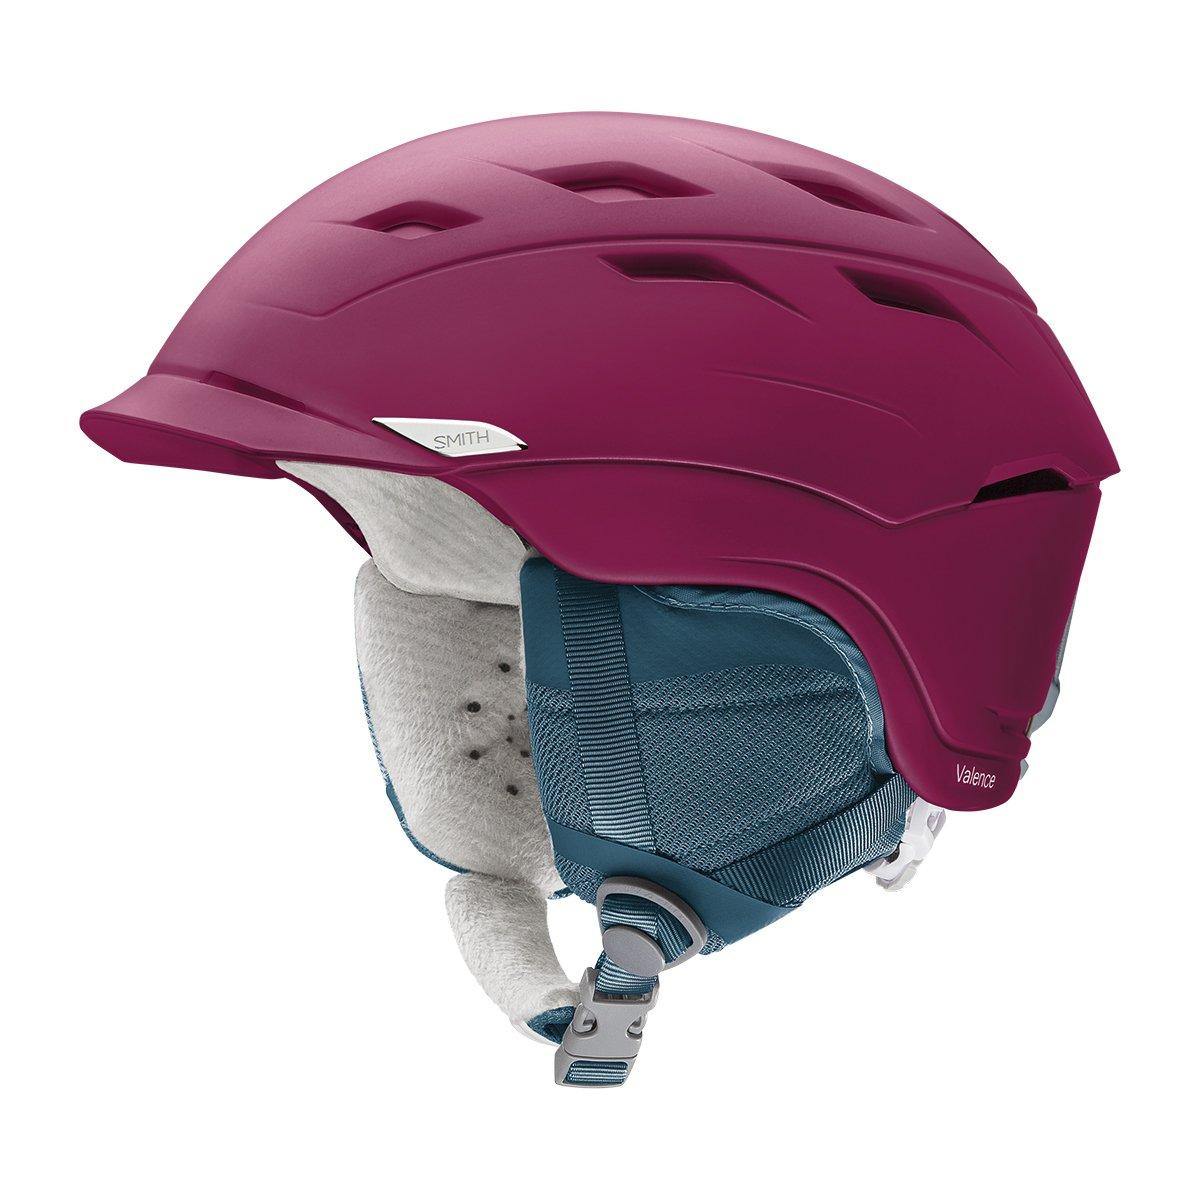 Smith Valence Snow Helmet - Matte Grape (Small) by Smith Optics